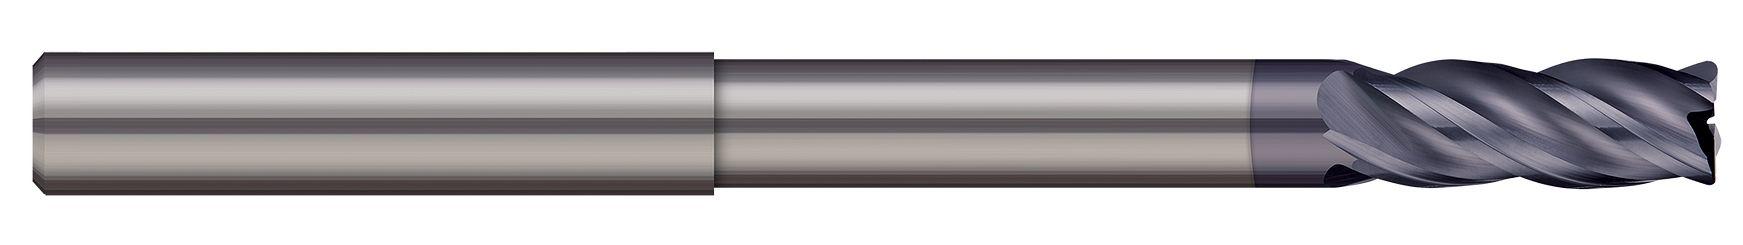 tool-details-VLR-625-4X